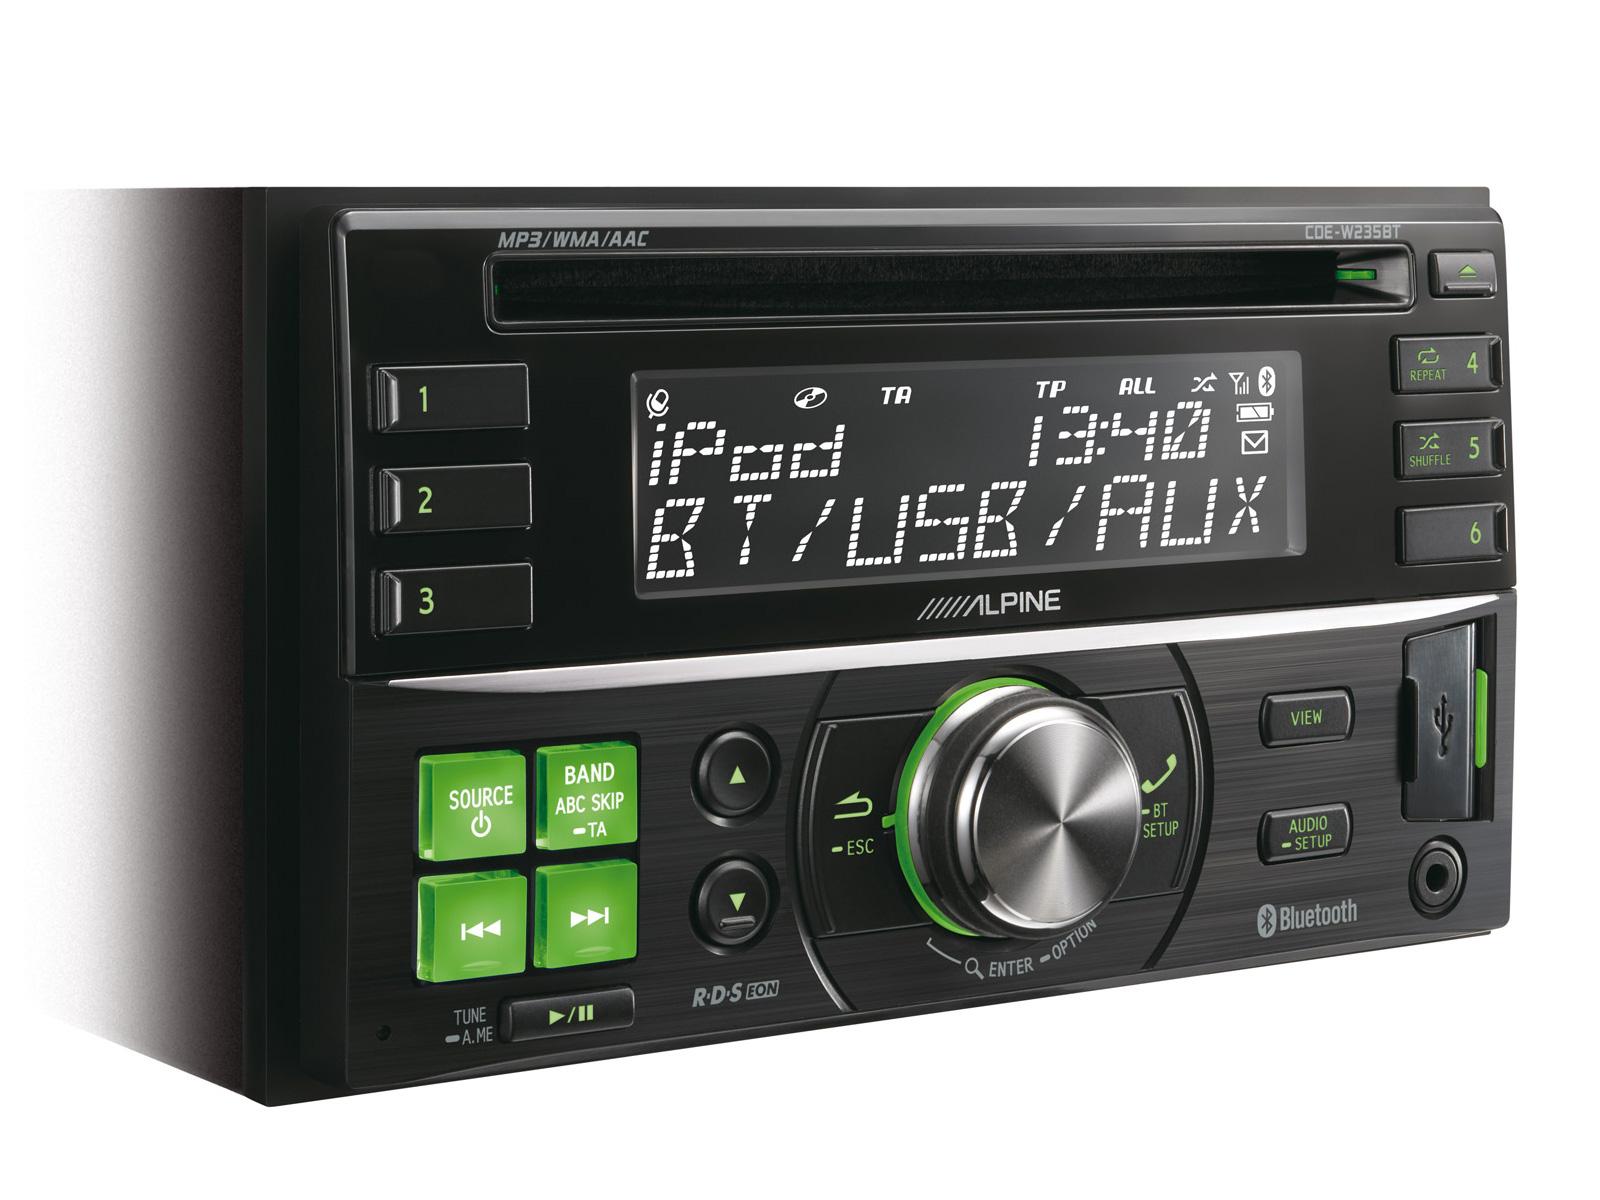 productpic_CDEW235BT_03 2 din cd receiver with advanced bluetooth alpine cde w235bt alpine cde-w235bt wiring diagram at n-0.co